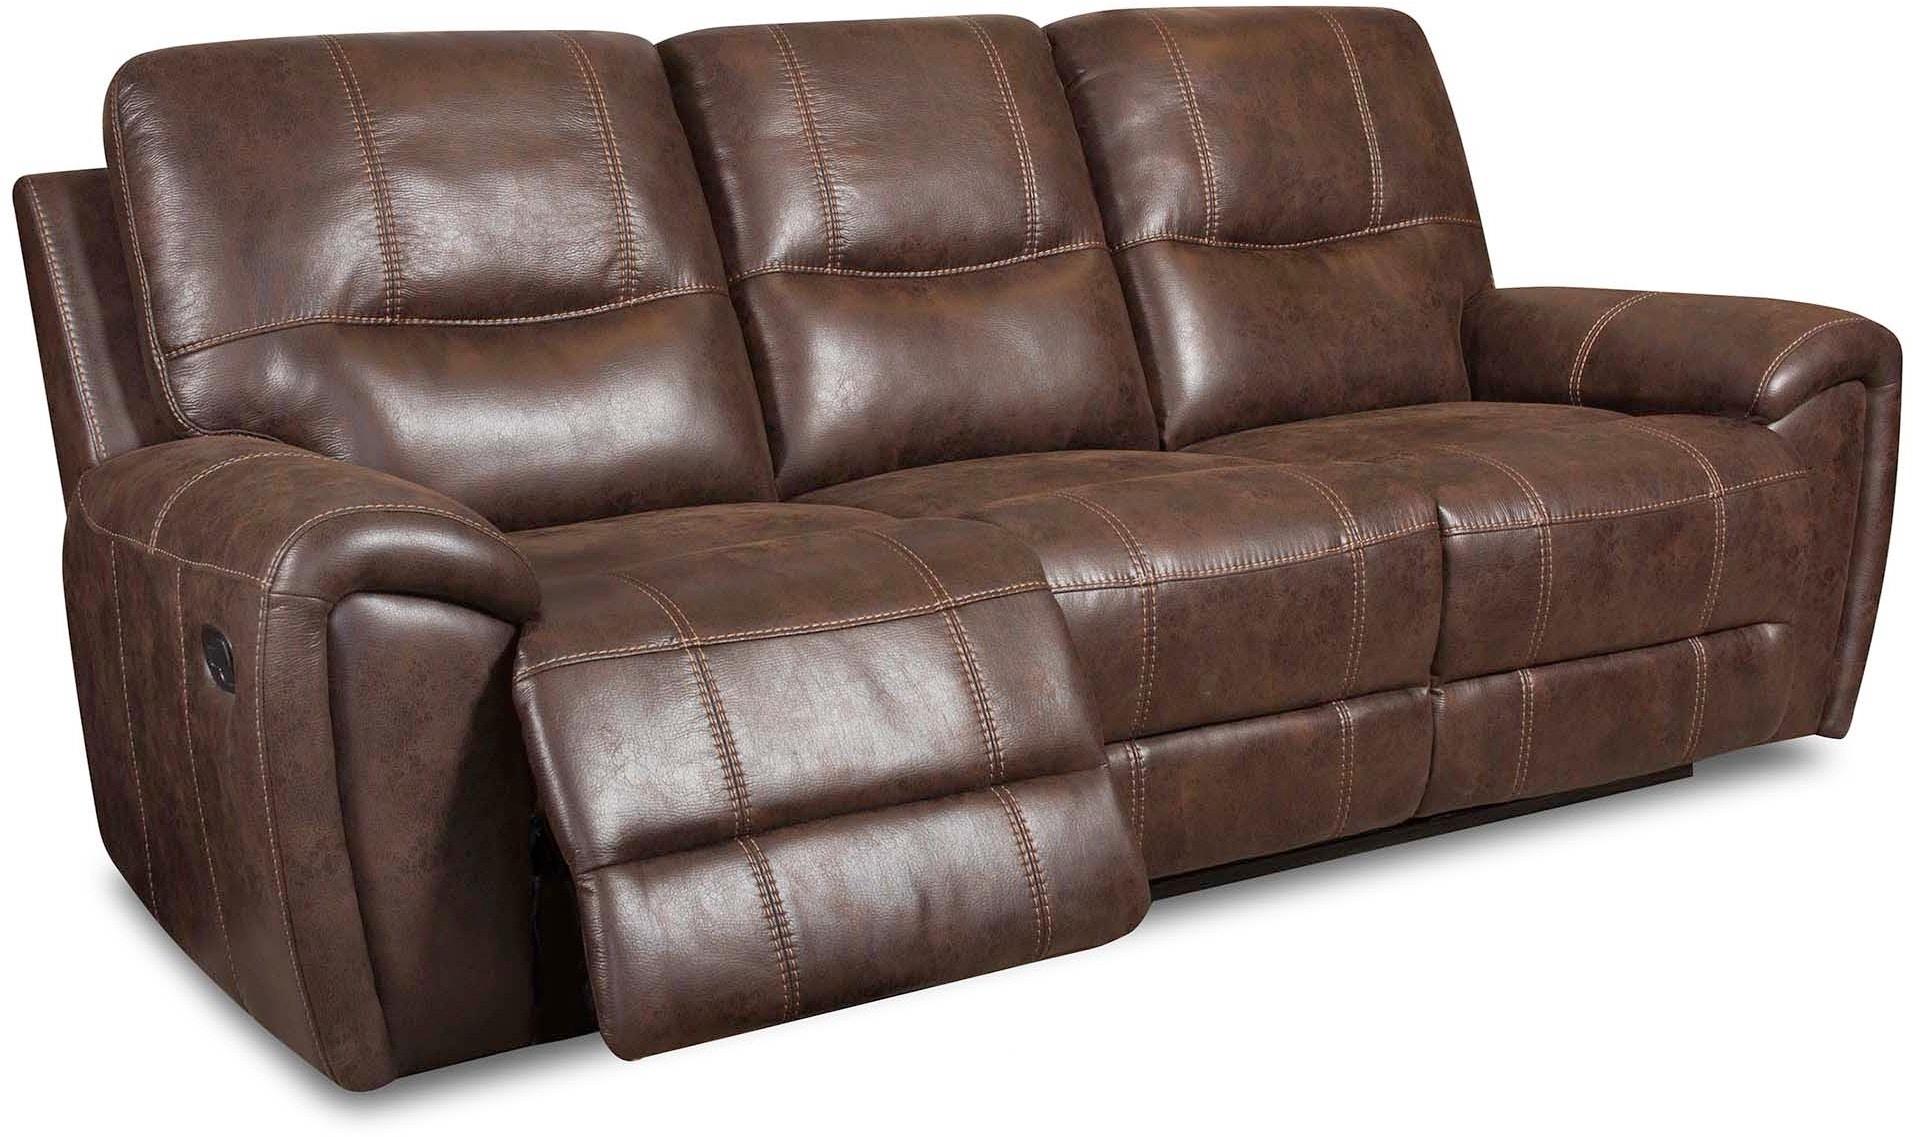 Corinthian Living Room Desert Chocolate Power Reclining Sofa